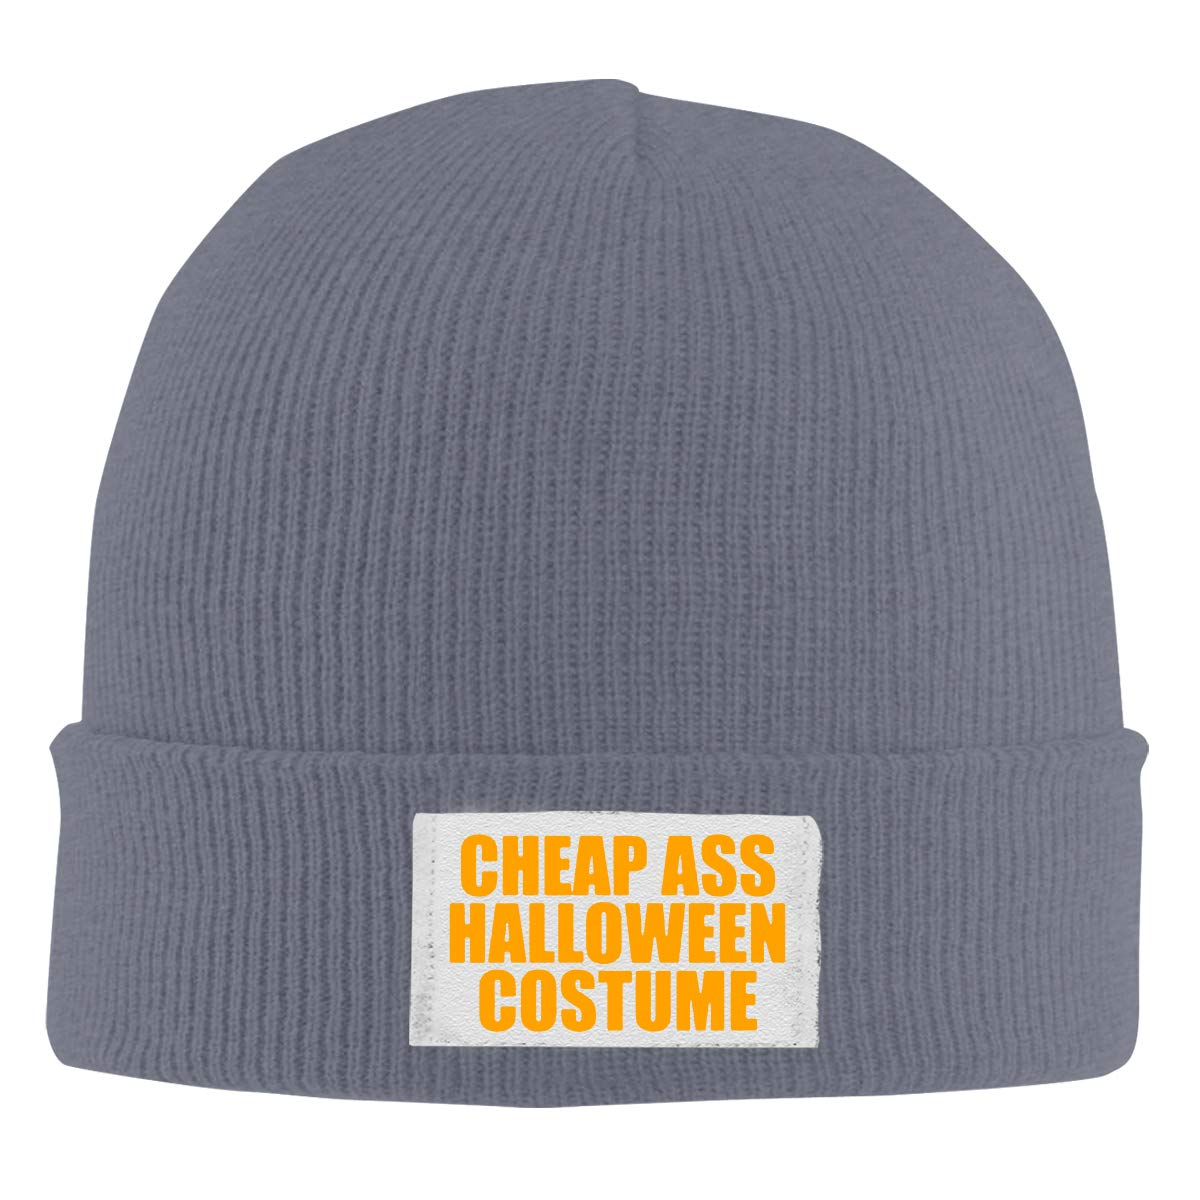 e8f4cd88900 Amazon.com  Winter Hat Knit Beanie Skull Cap Cheap Ass Halloween Costume  Classic   Wool Hats For Men Women  Clothing